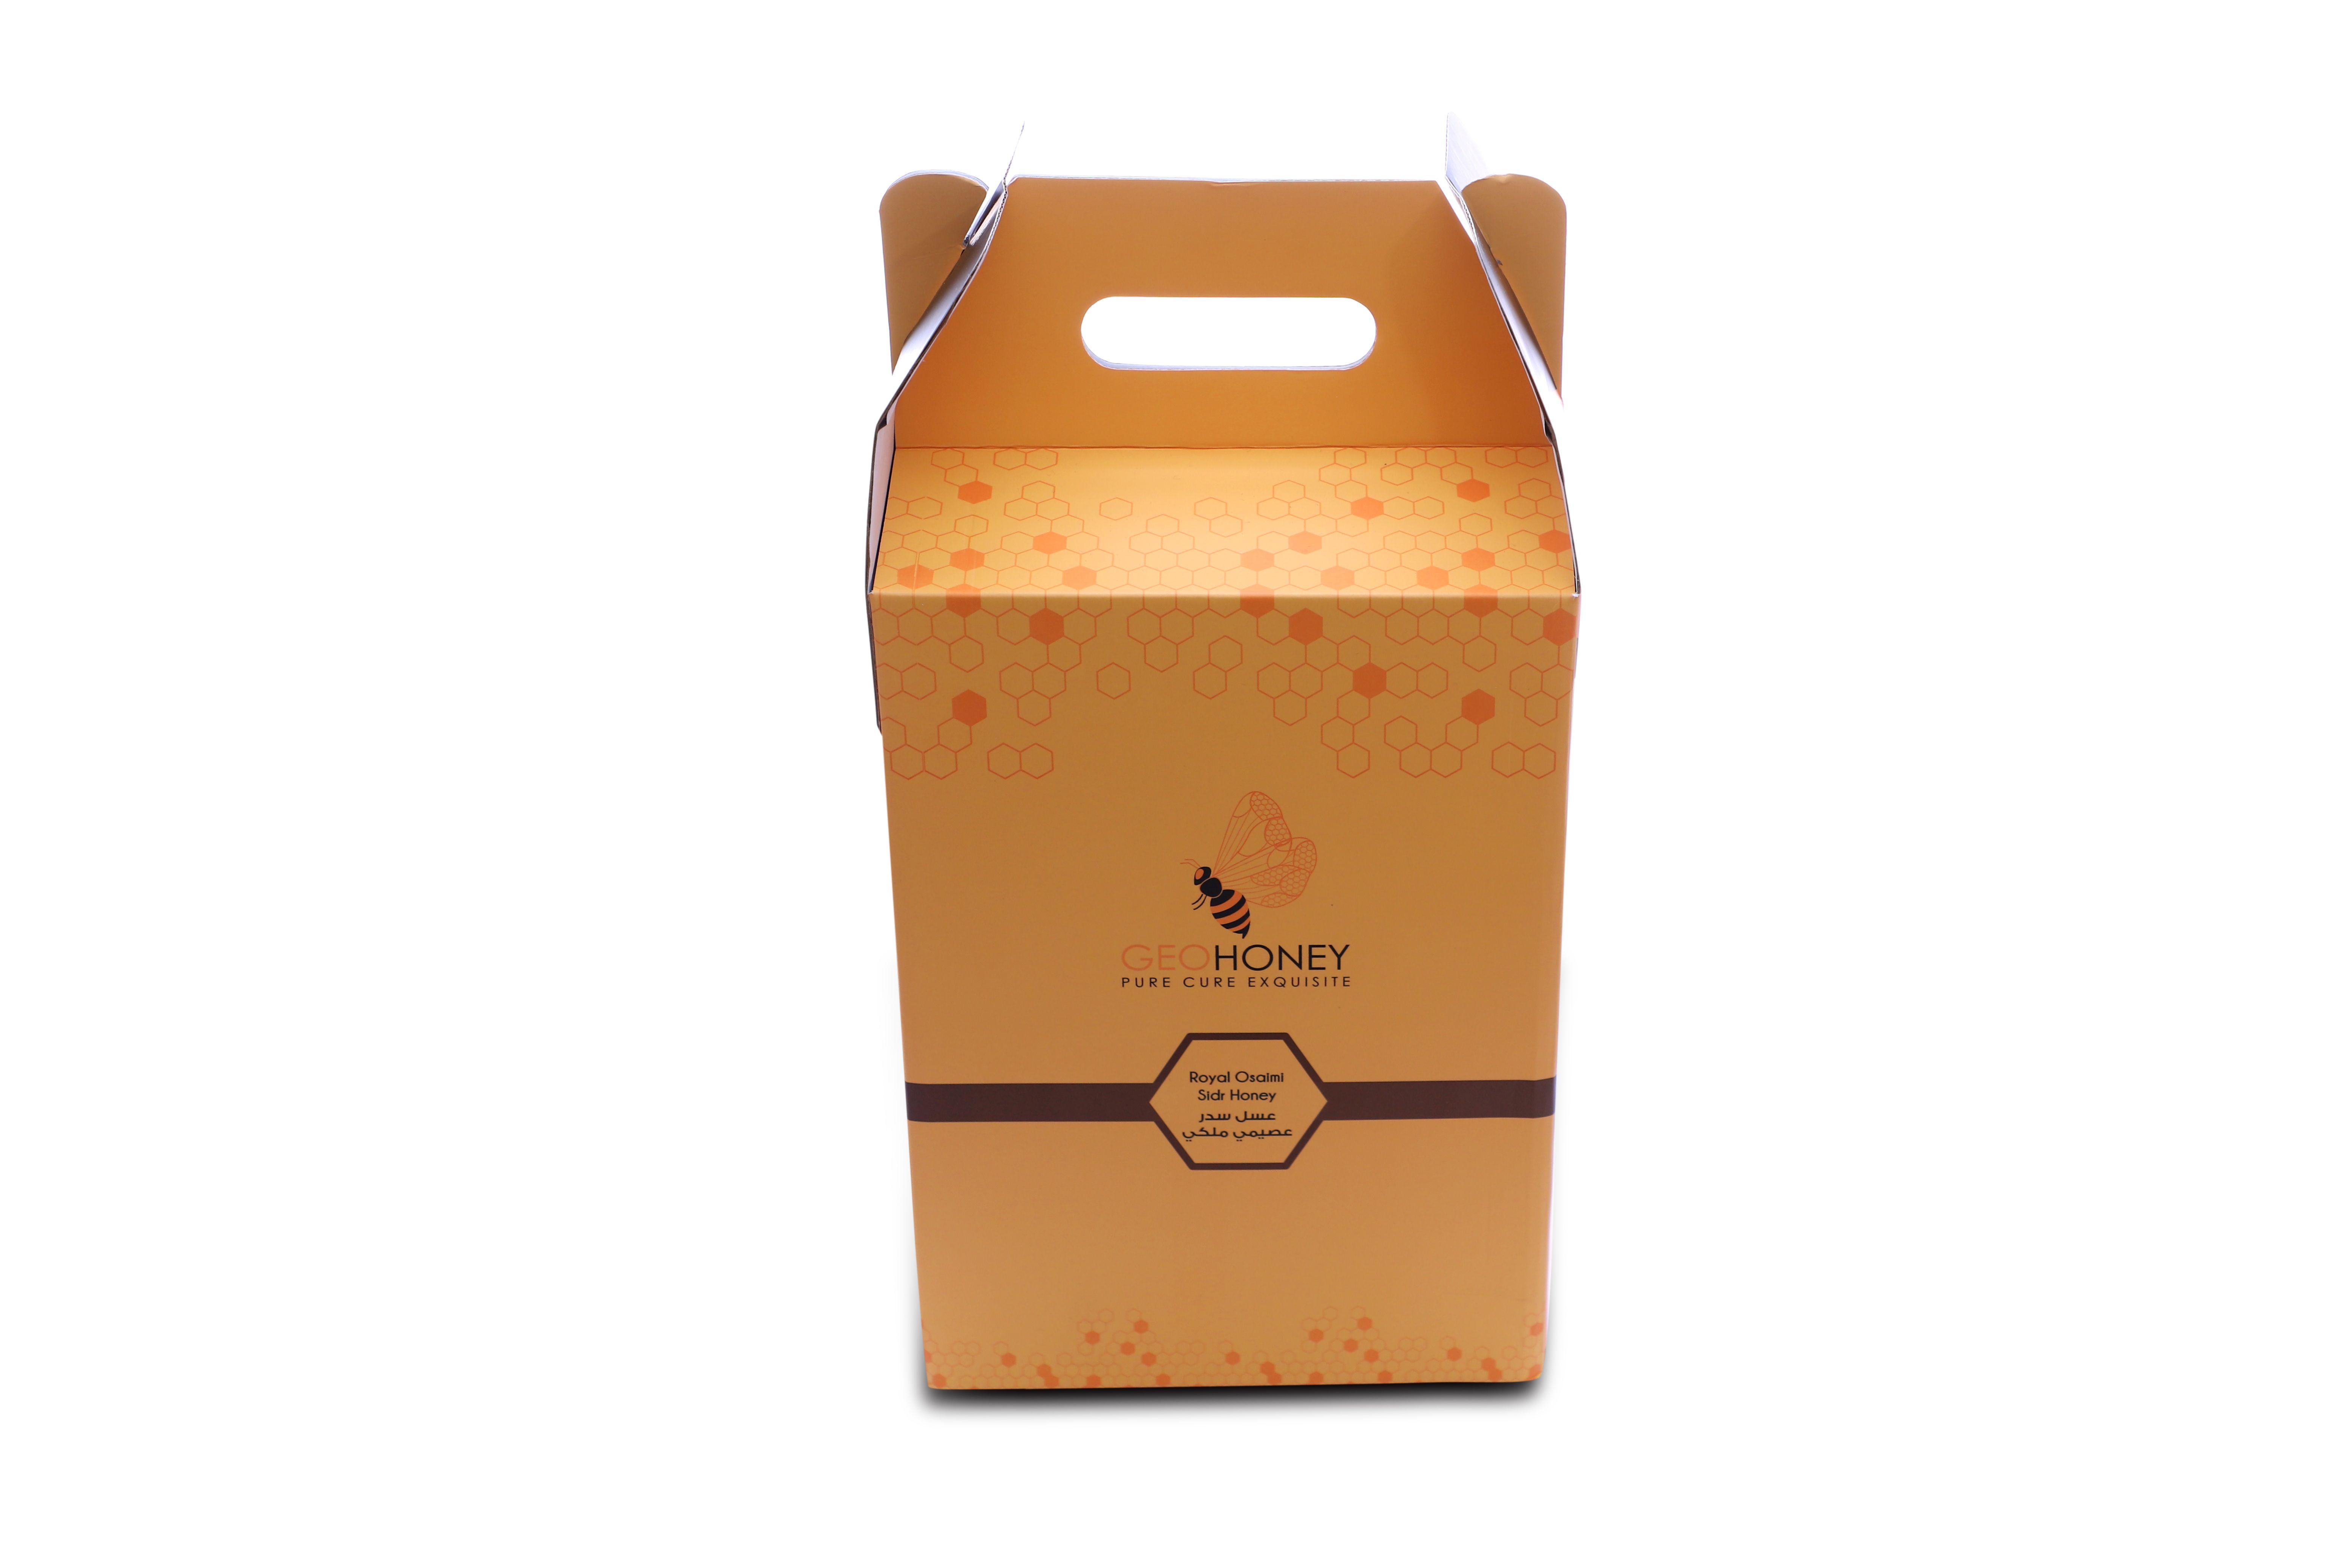 Osaimi Honey Dubai Best Honey Organic Honey World Best Honey